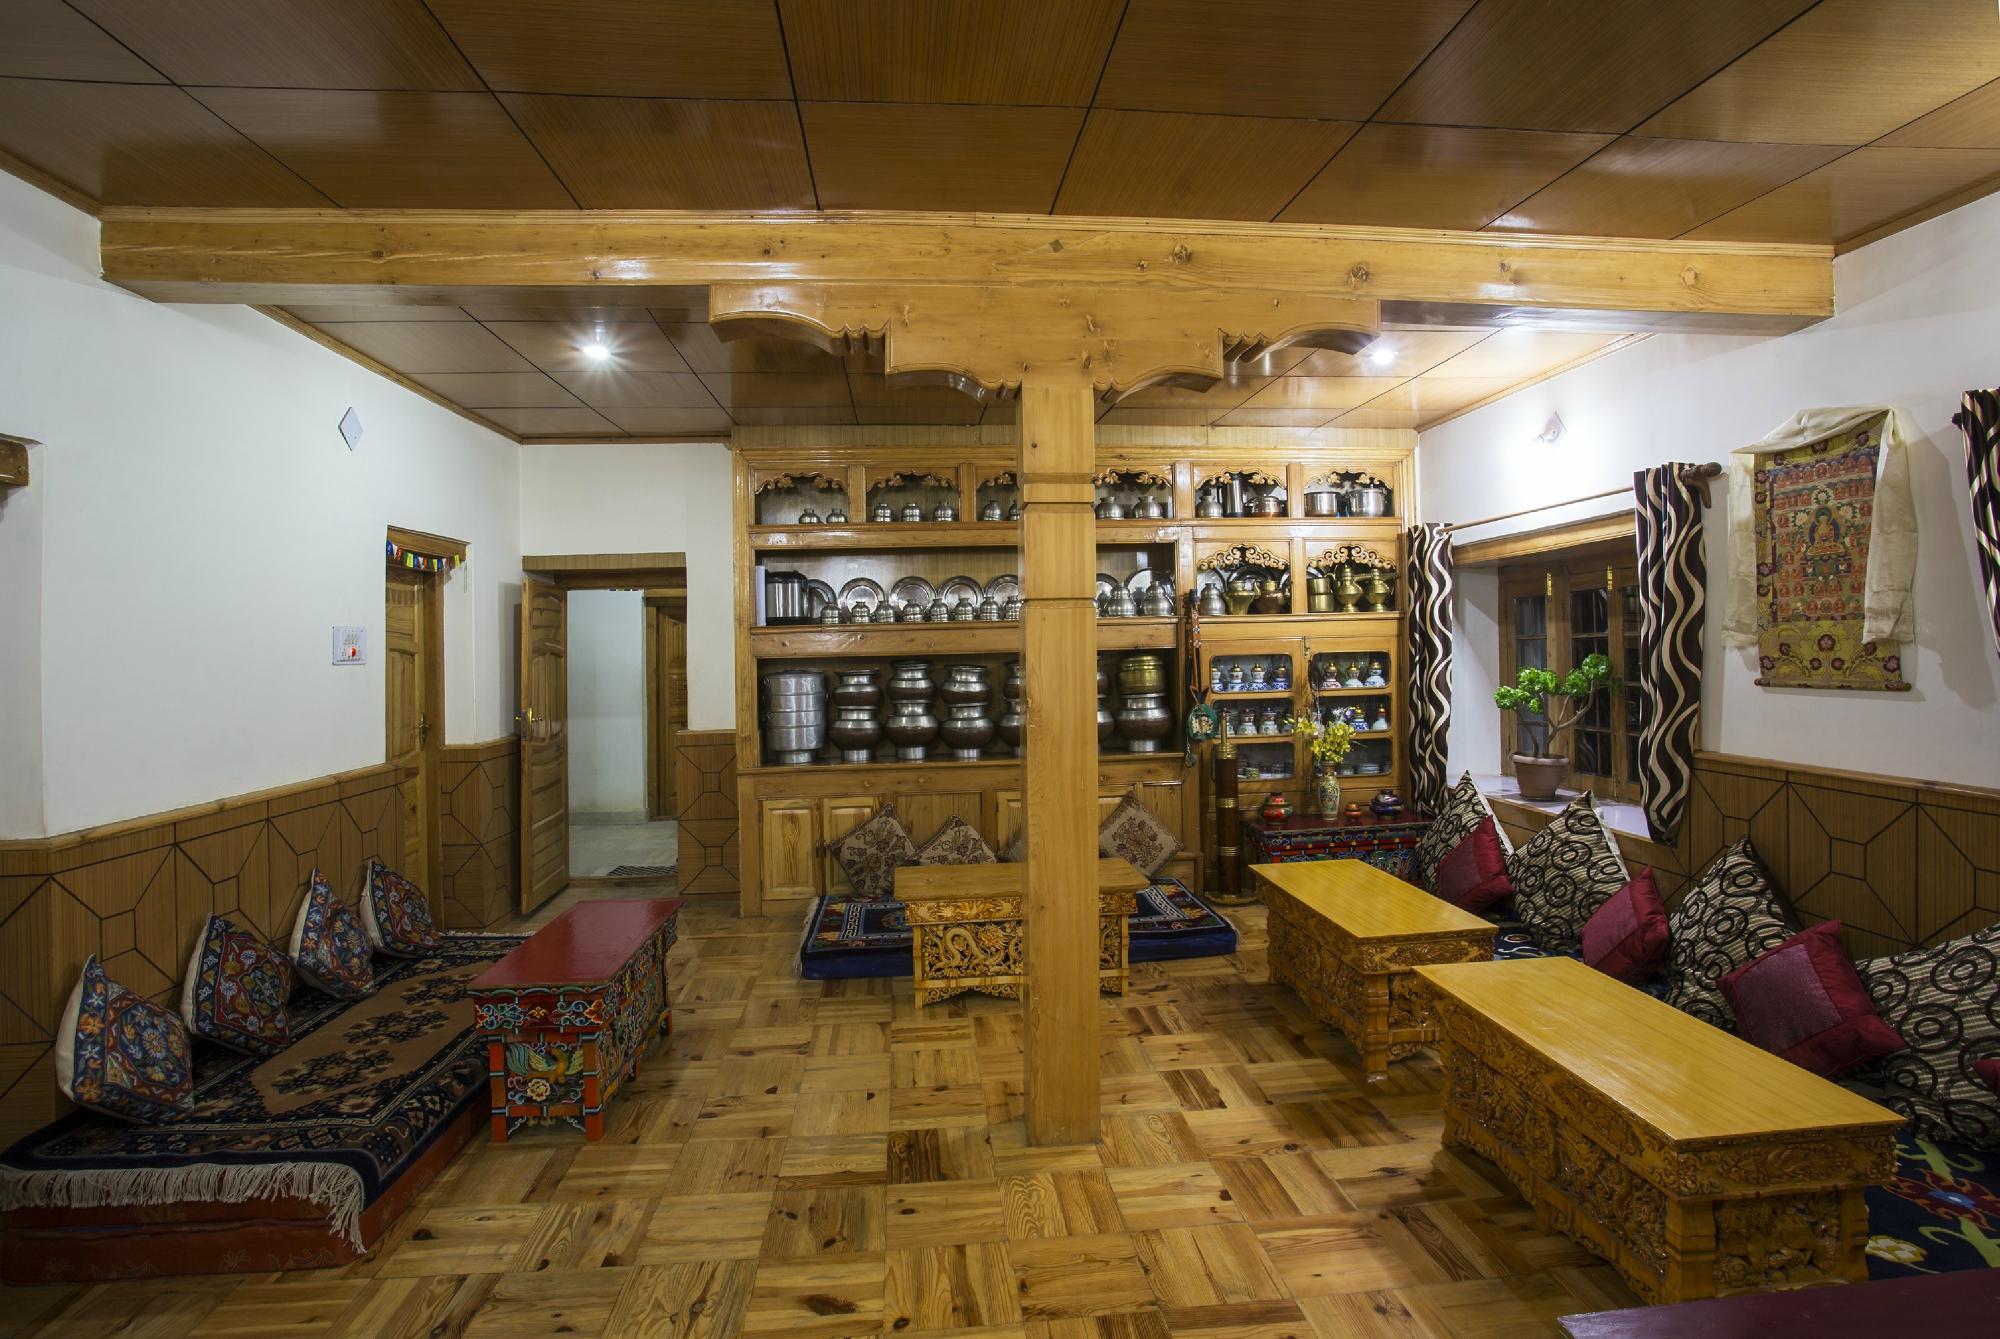 shaolin-guest-housebg